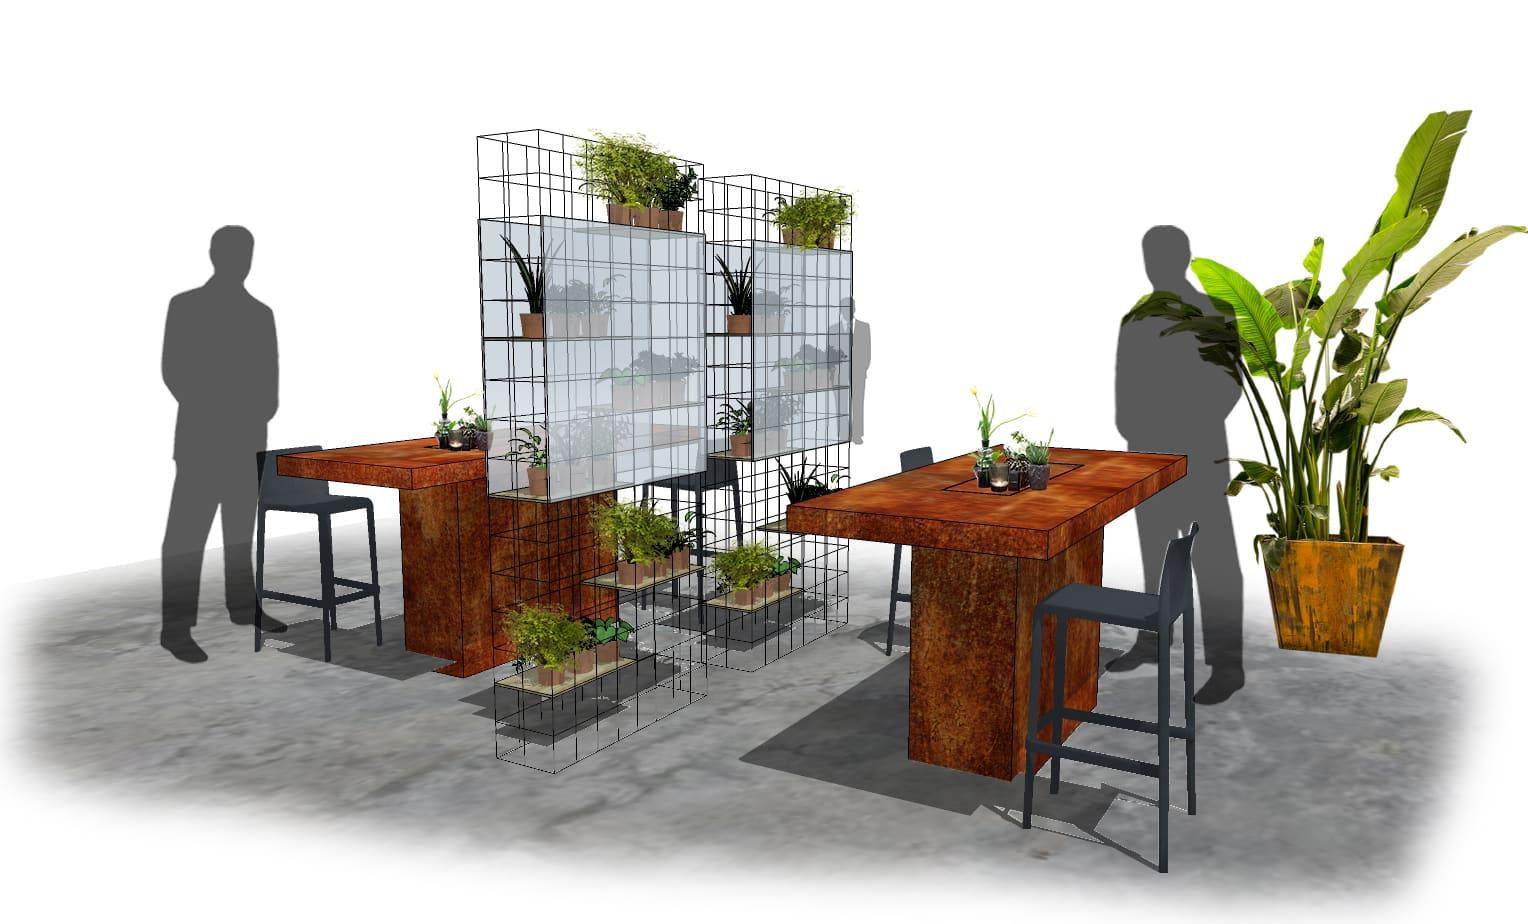 Raumteiler green touch clear Raumtrenner aus Stahlrahmen mit Pflanzendekoartion Grünpflanzen Plexiglasscheibe Bas de Boer Eventstyling für social distancing - Raumteiler / Raumtrenner